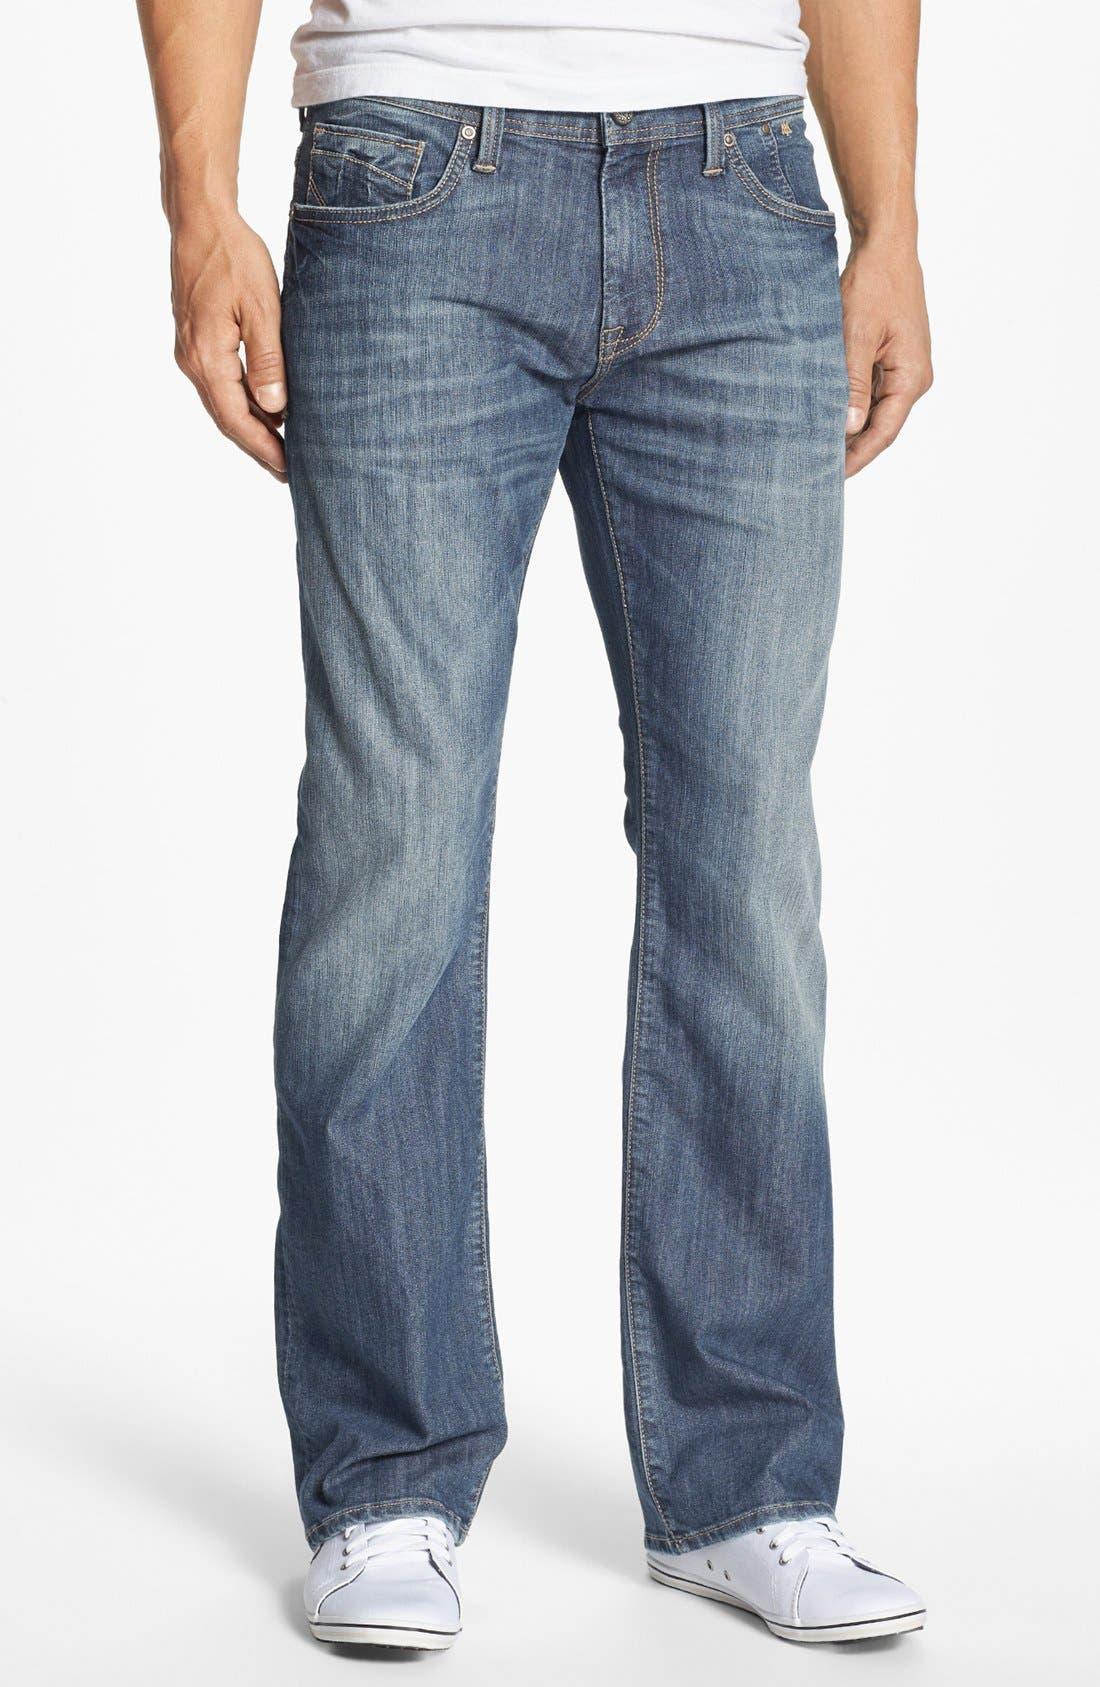 Alternate Image 2  - Mavi Jeans 'Josh' Bootcut Jeans (Brushed American Comfort) (Online Only)